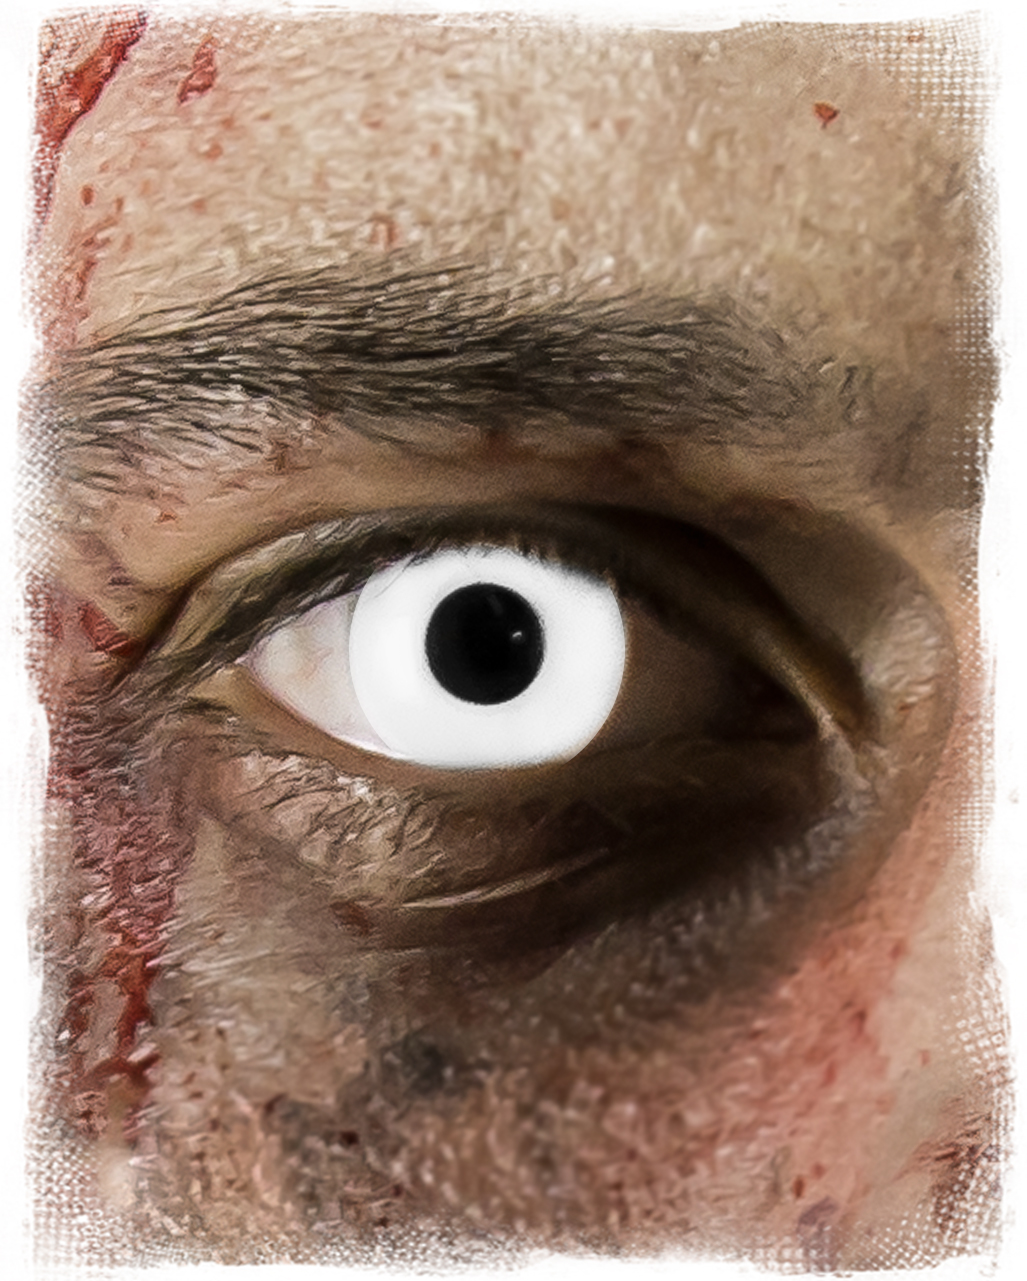 wie bekomme ich kontaktlinsen